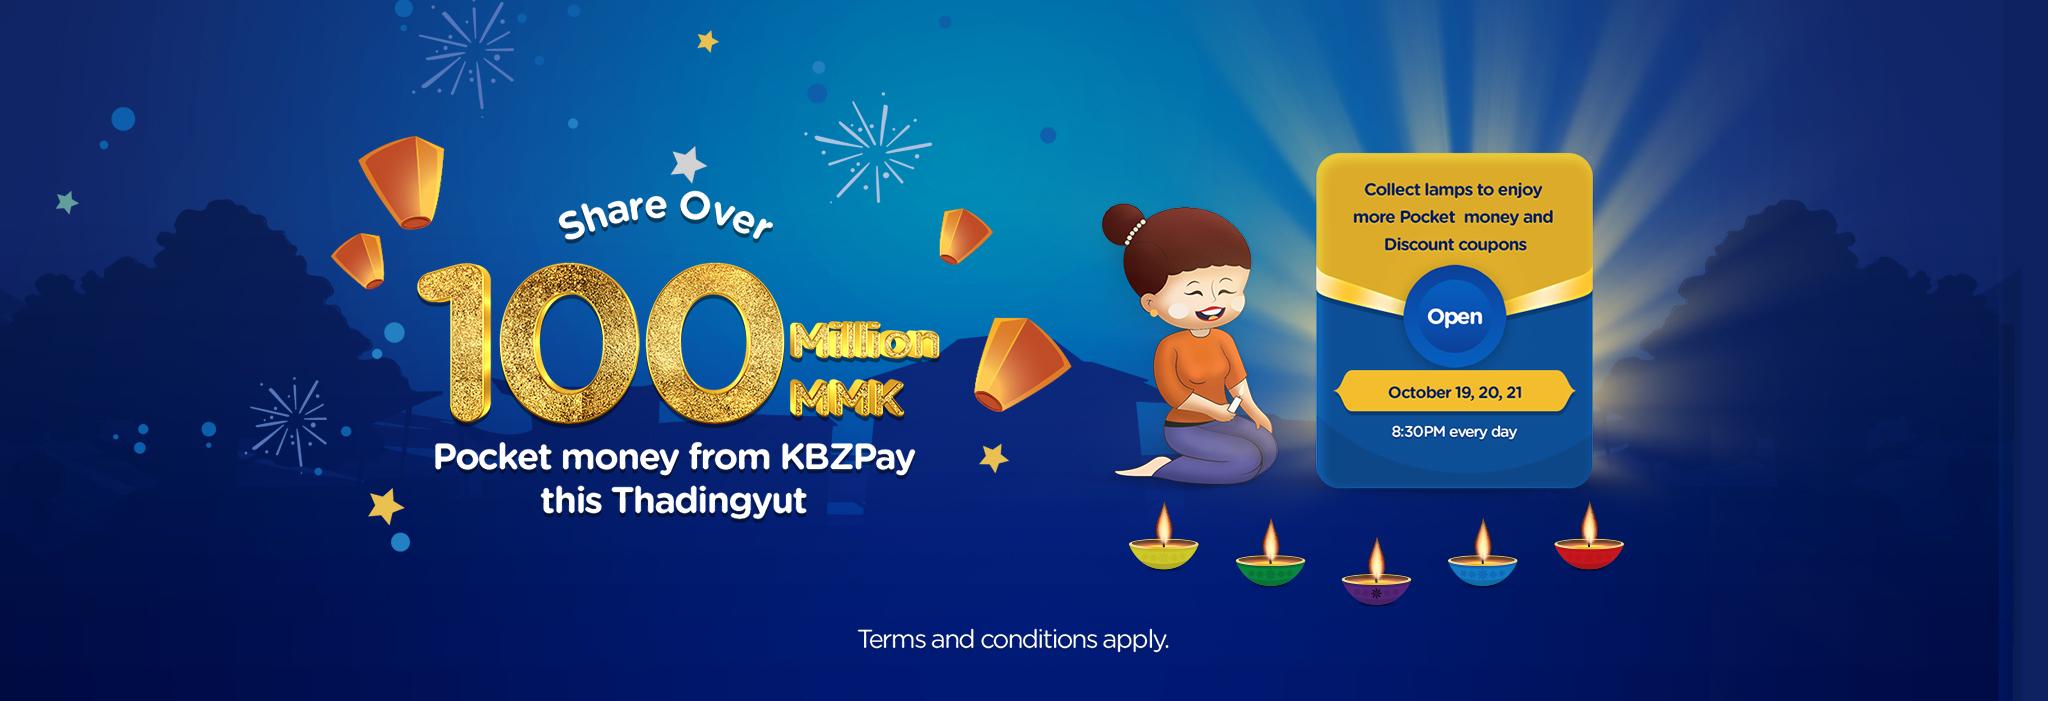 Share over 100 million MMK pocket money from KBZPay this Thadingyut